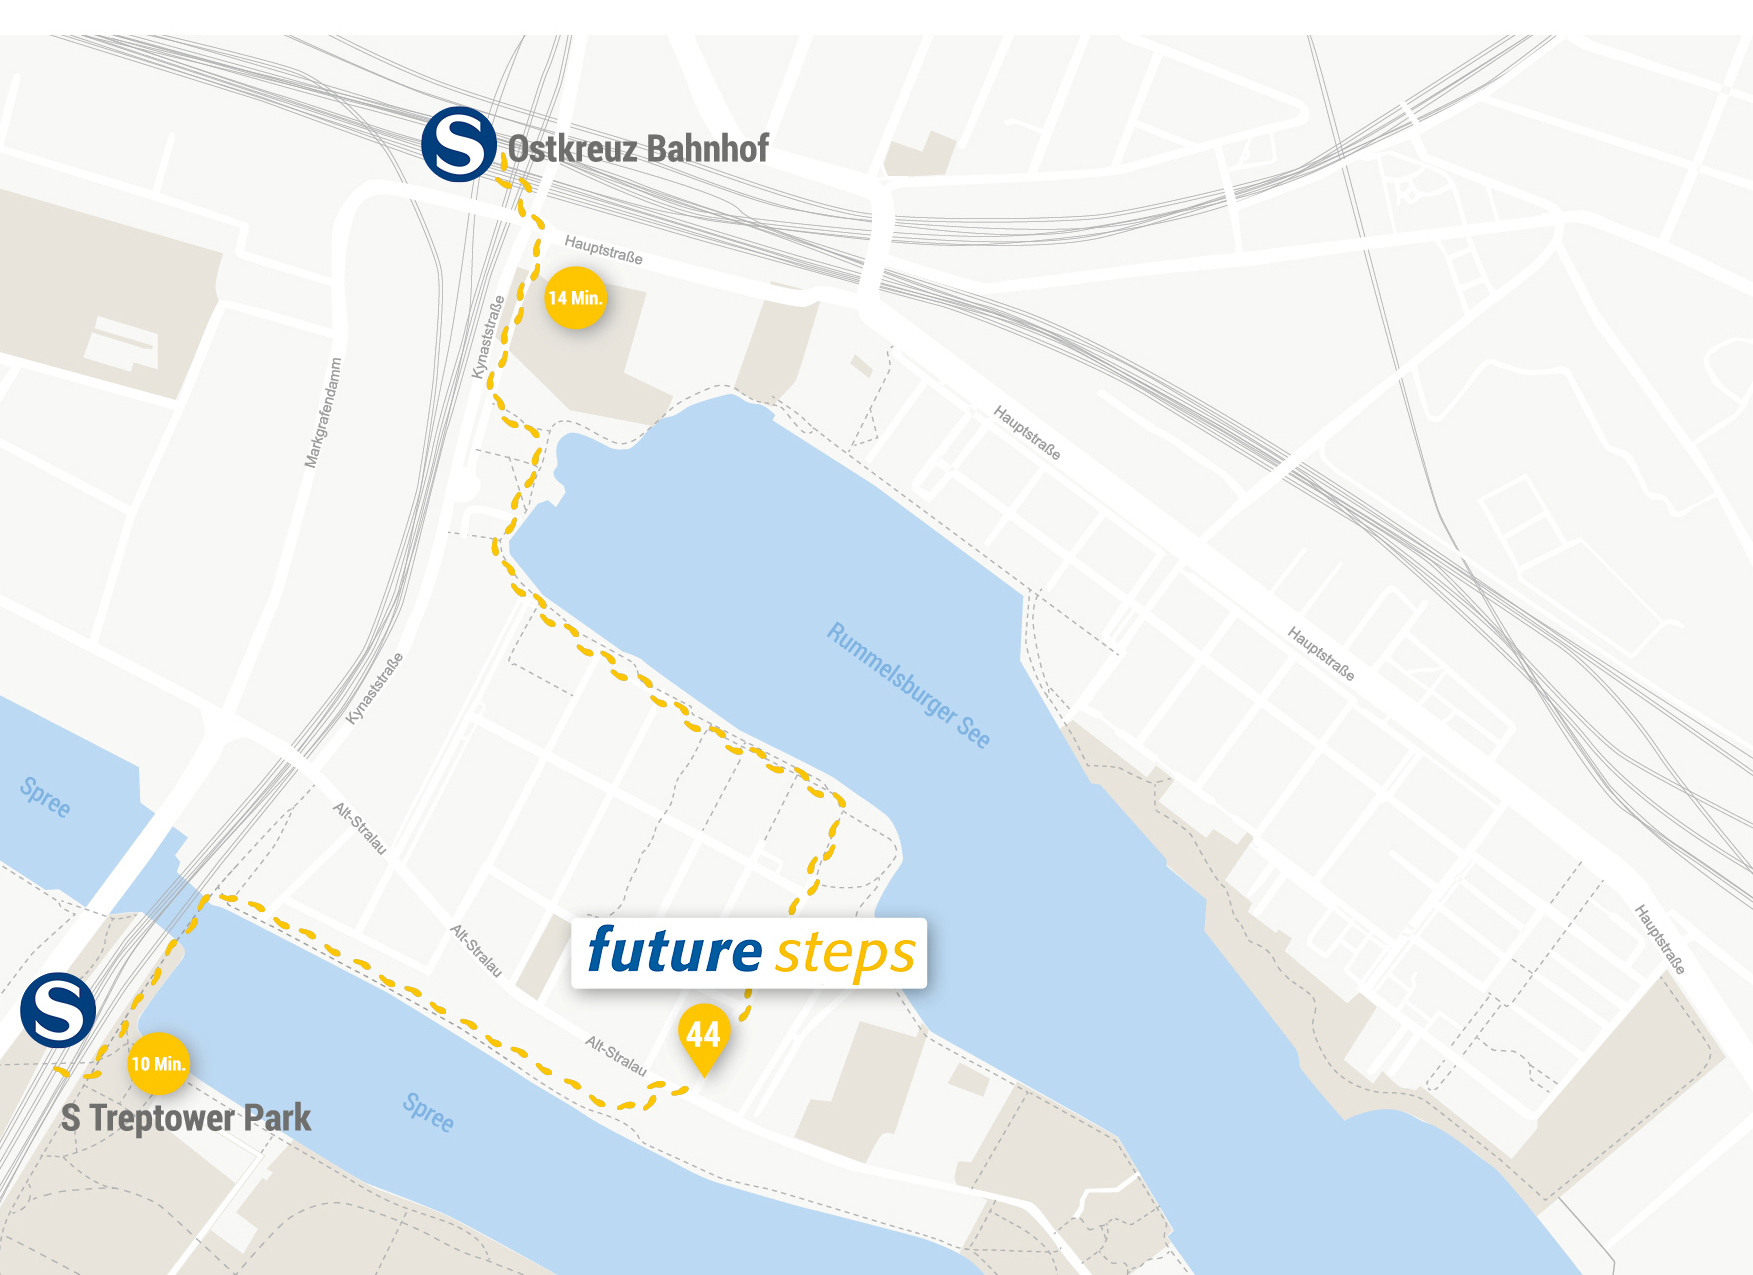 Stadtplan future steps - Unternehmensberatung